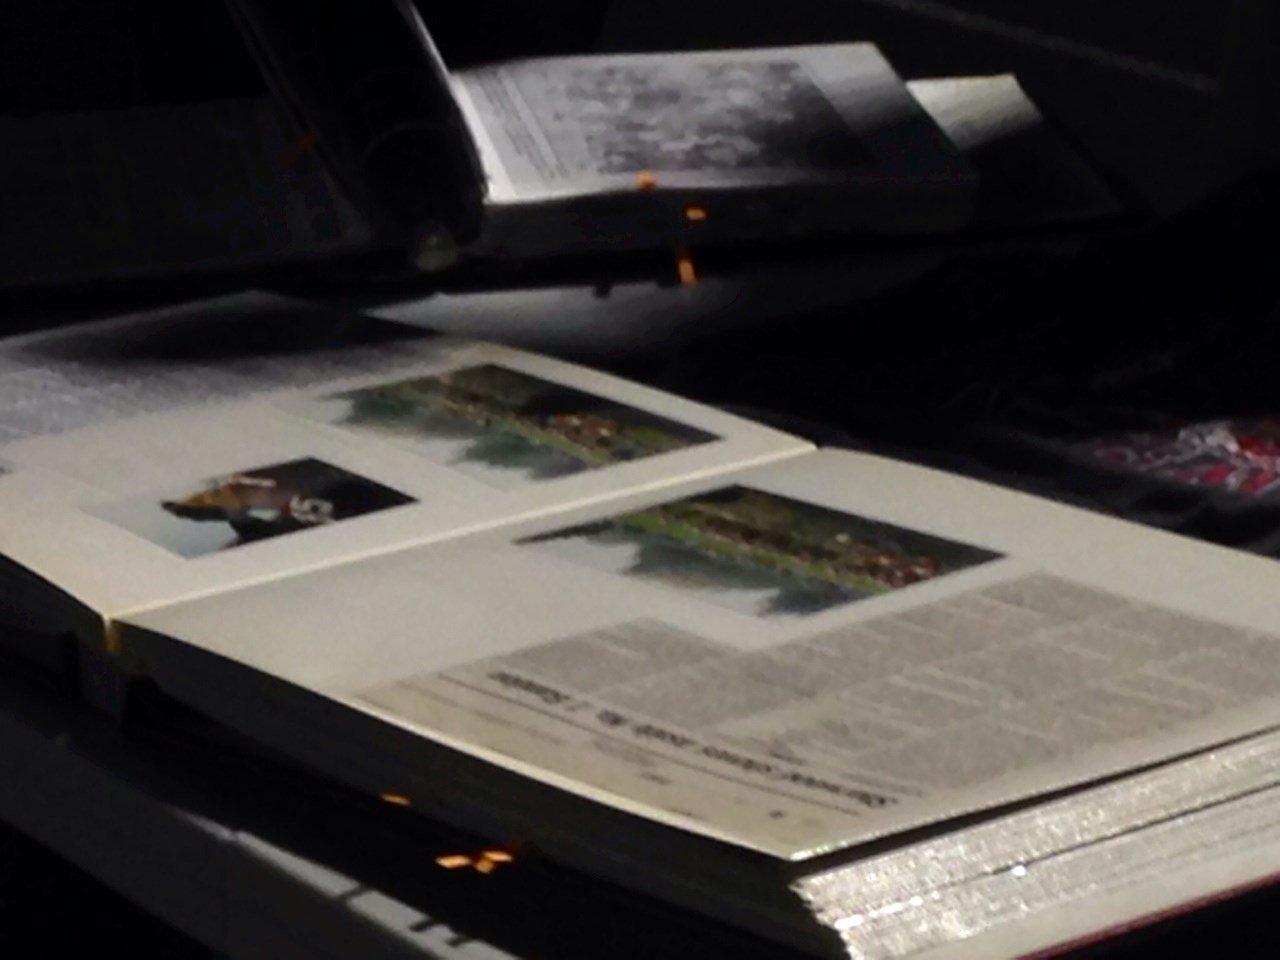 A scrapbook on display at Monday's vigil at Sherwood High School.